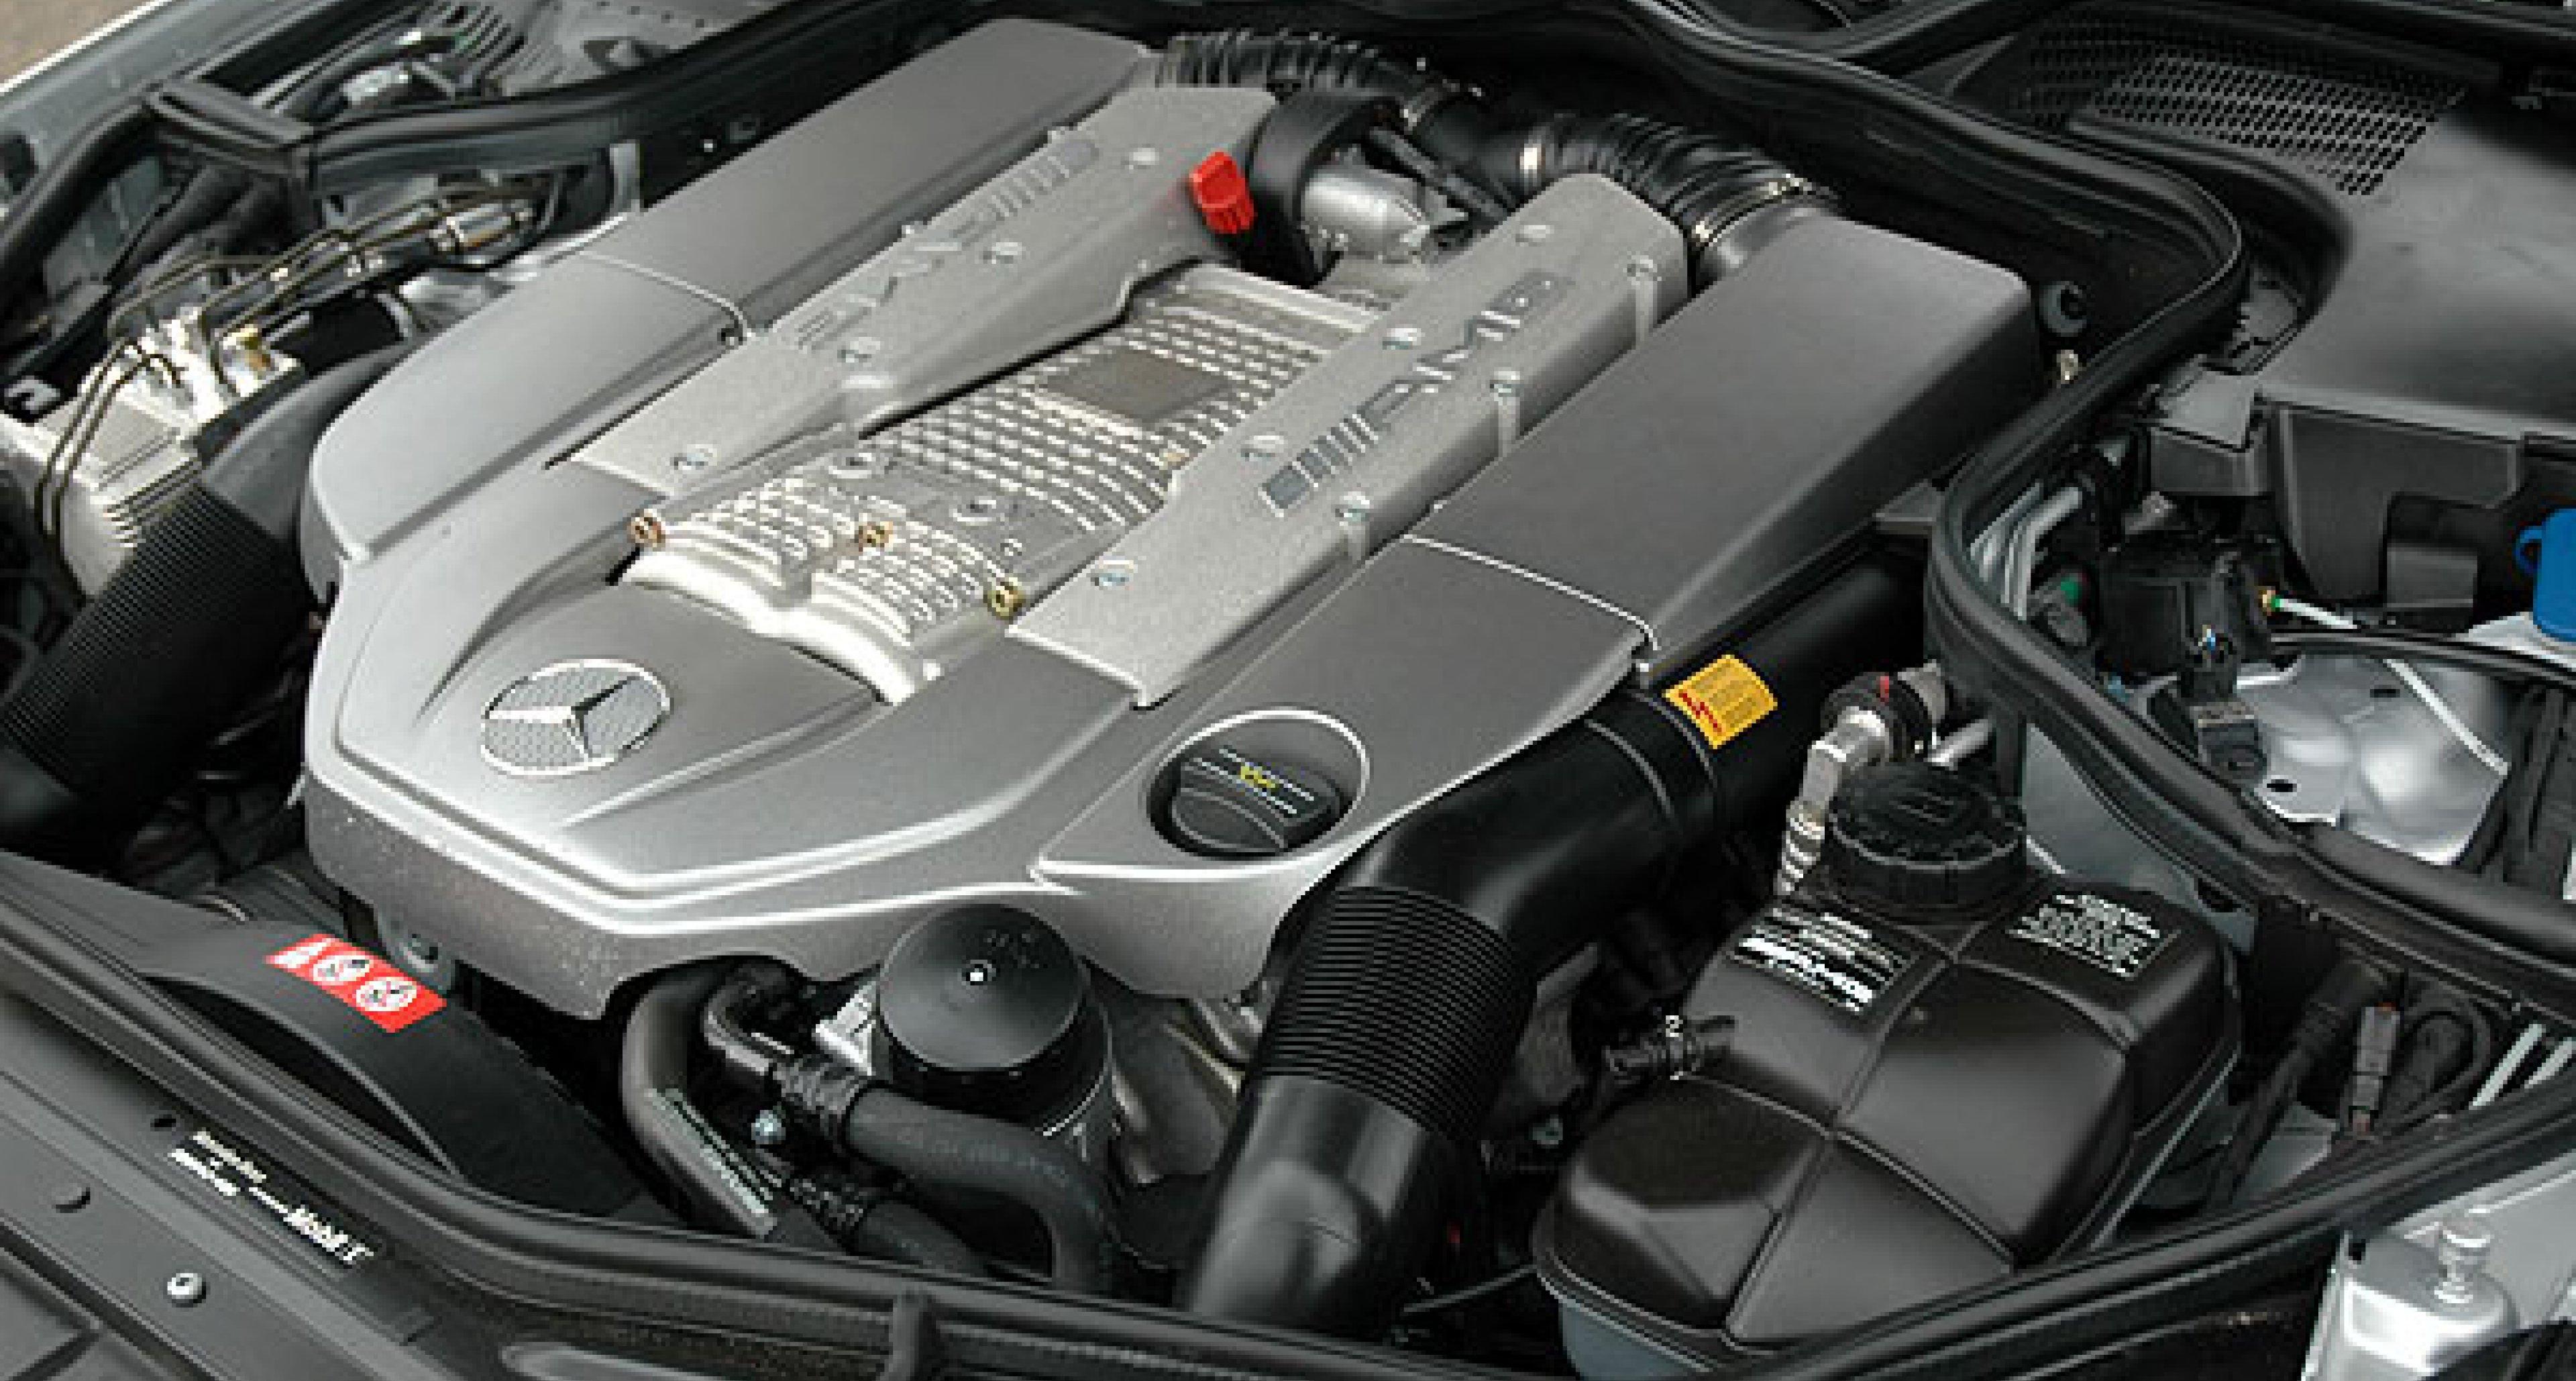 Mercedes benz cls 55 amg classic driver magazine mercedes benz cls 55 amg publicscrutiny Gallery